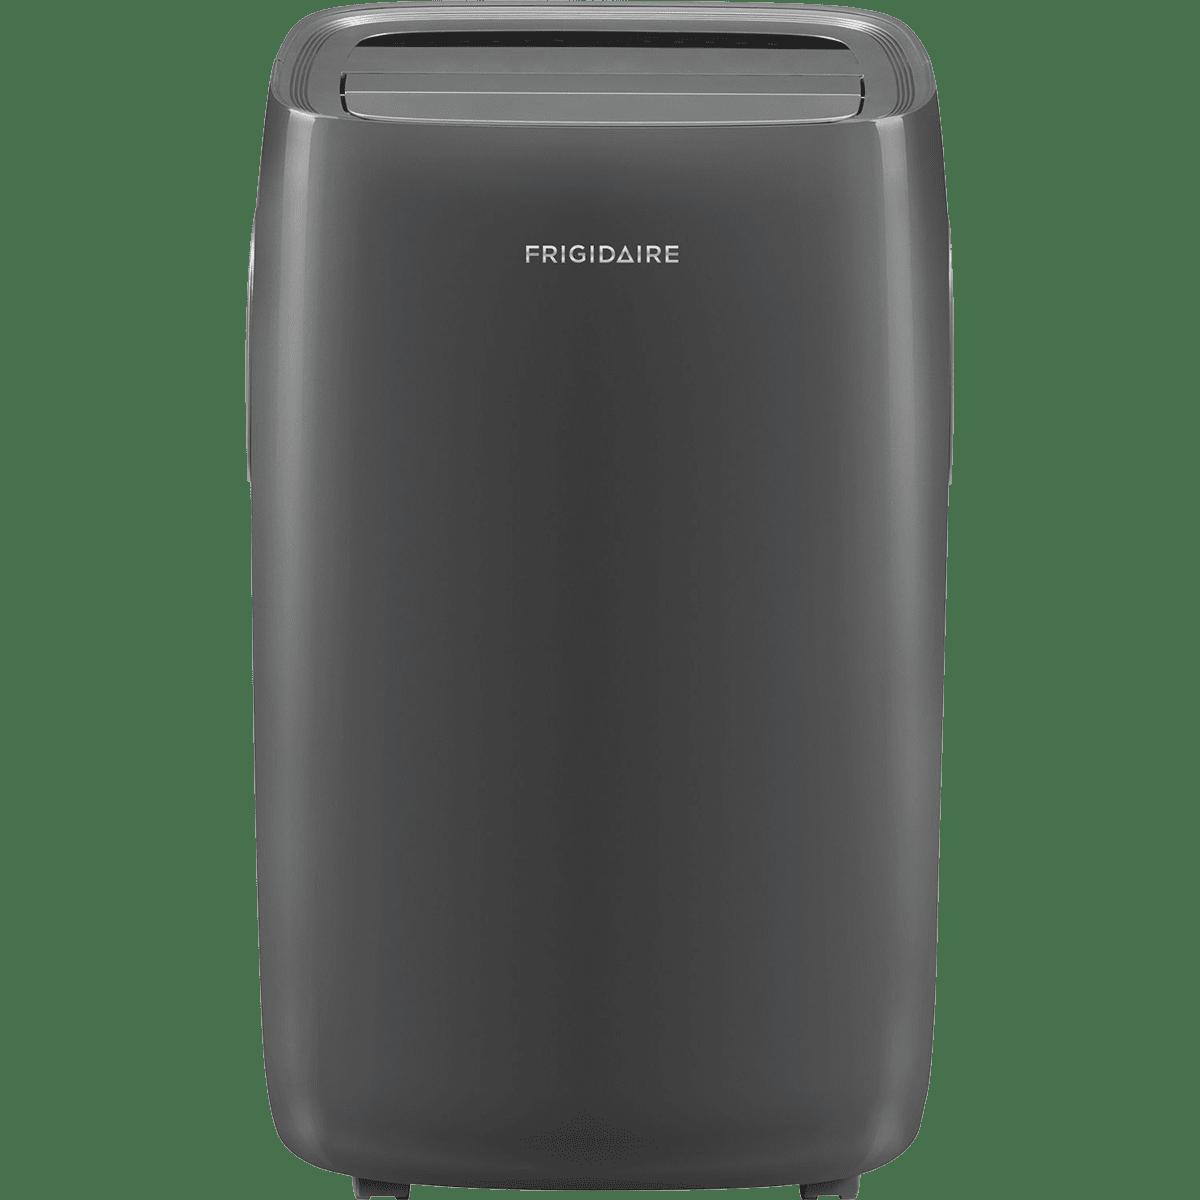 Frigidaire 12,000 BTU Portable Air Conditioner w/ Heat fr6402